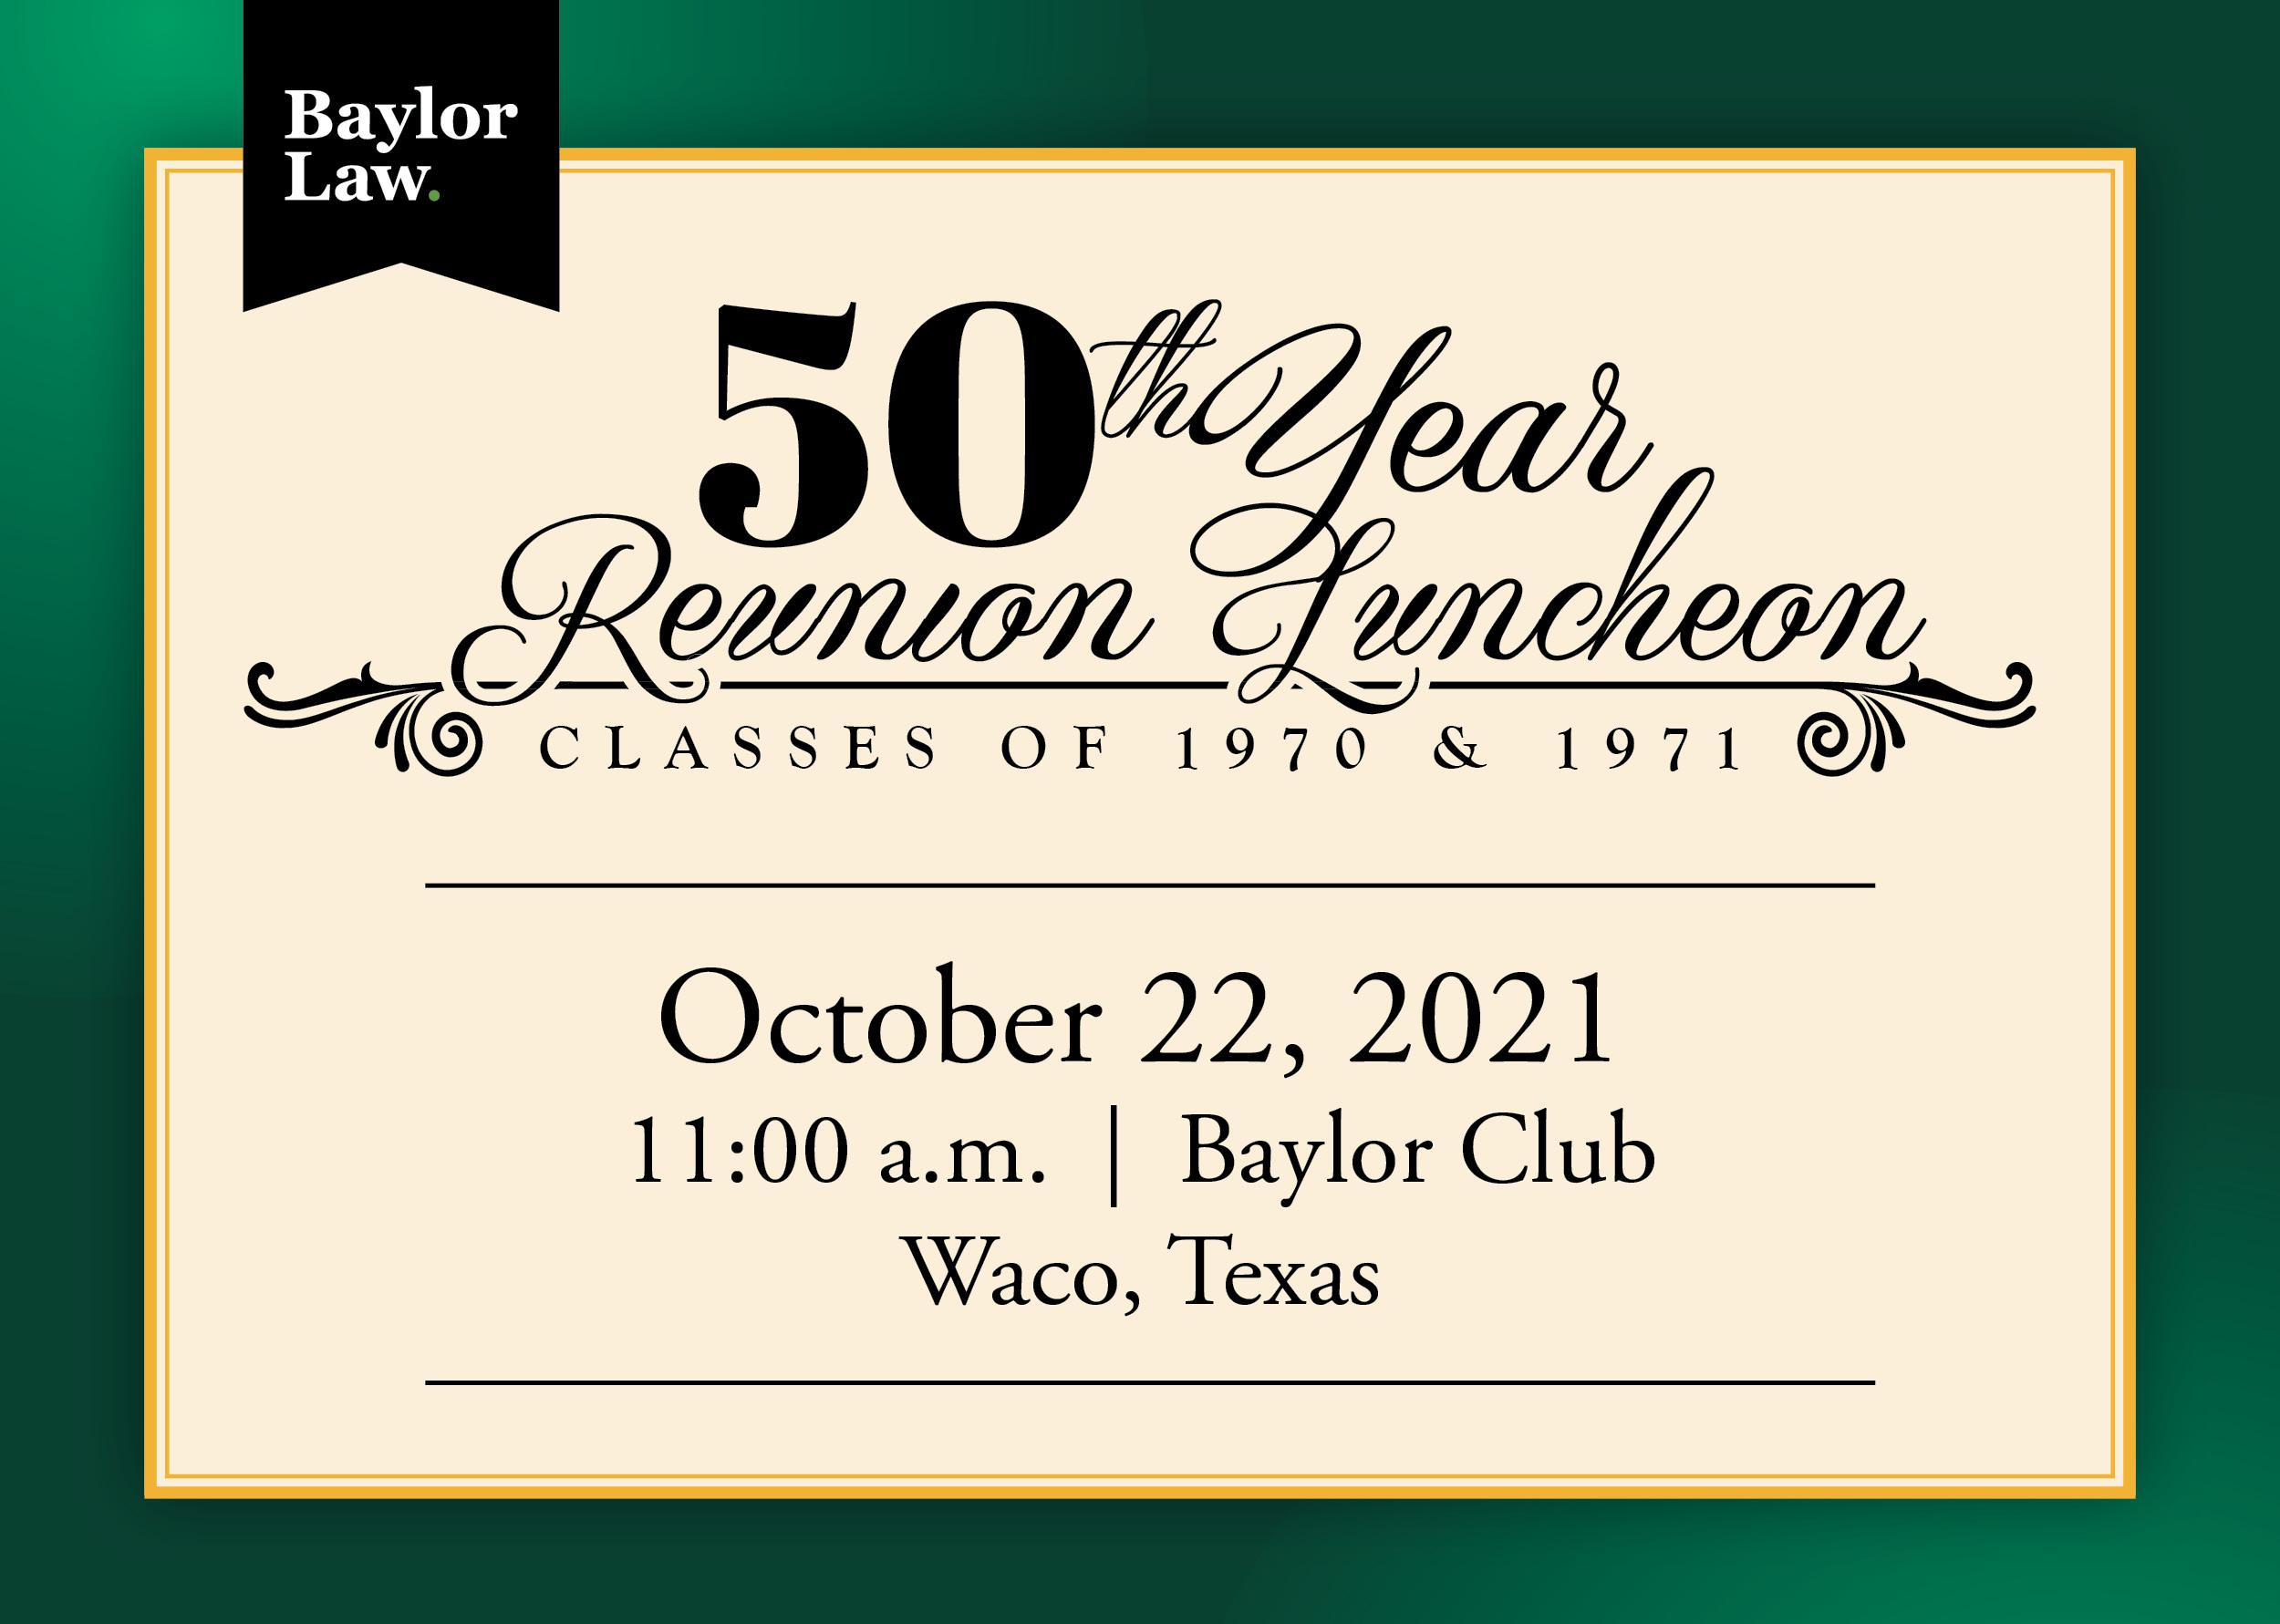 Baylor Law 50th Reunion